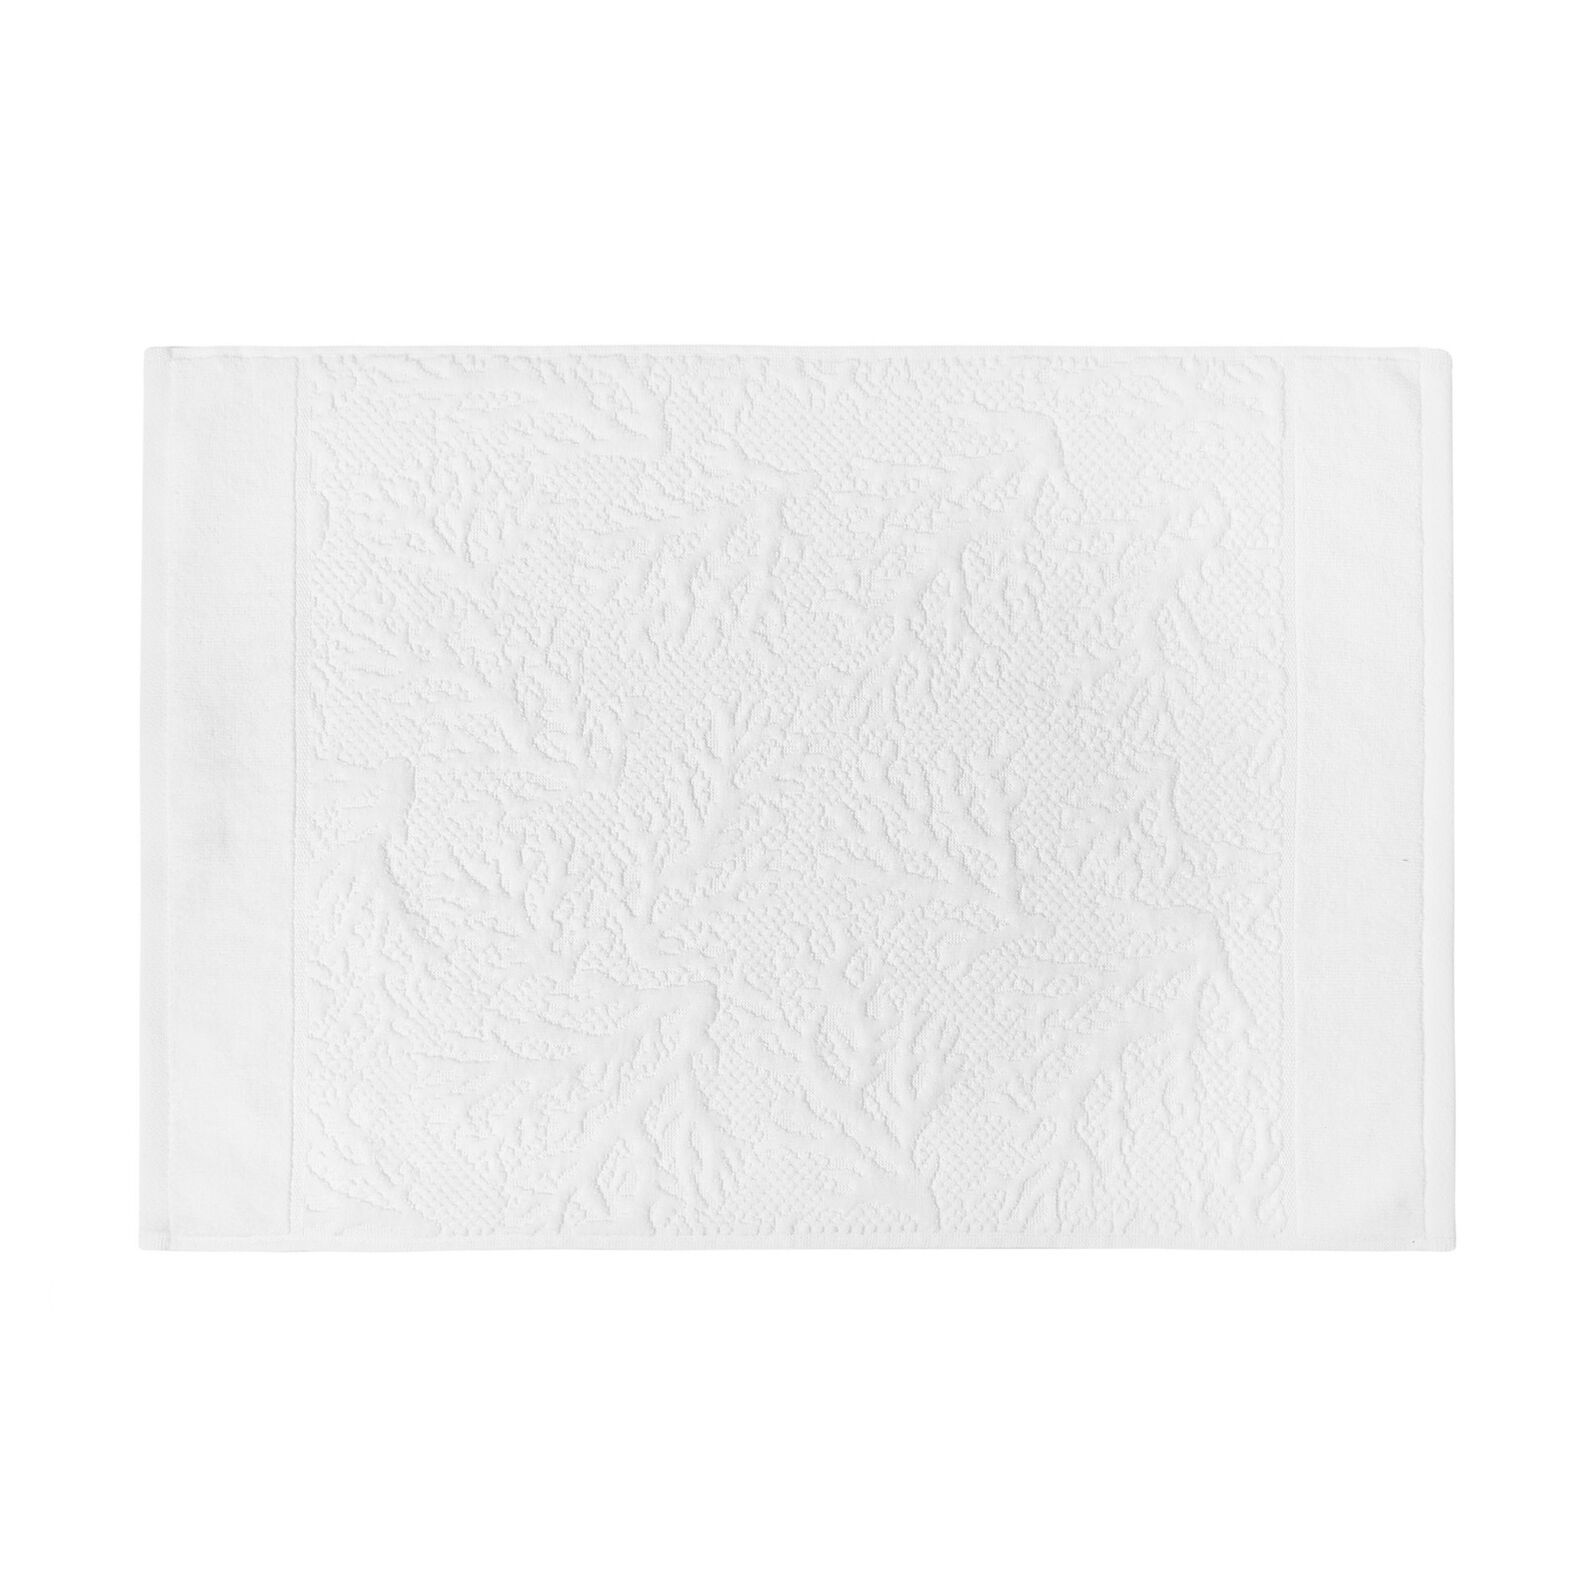 100% cotton jacquard towel with coral motif